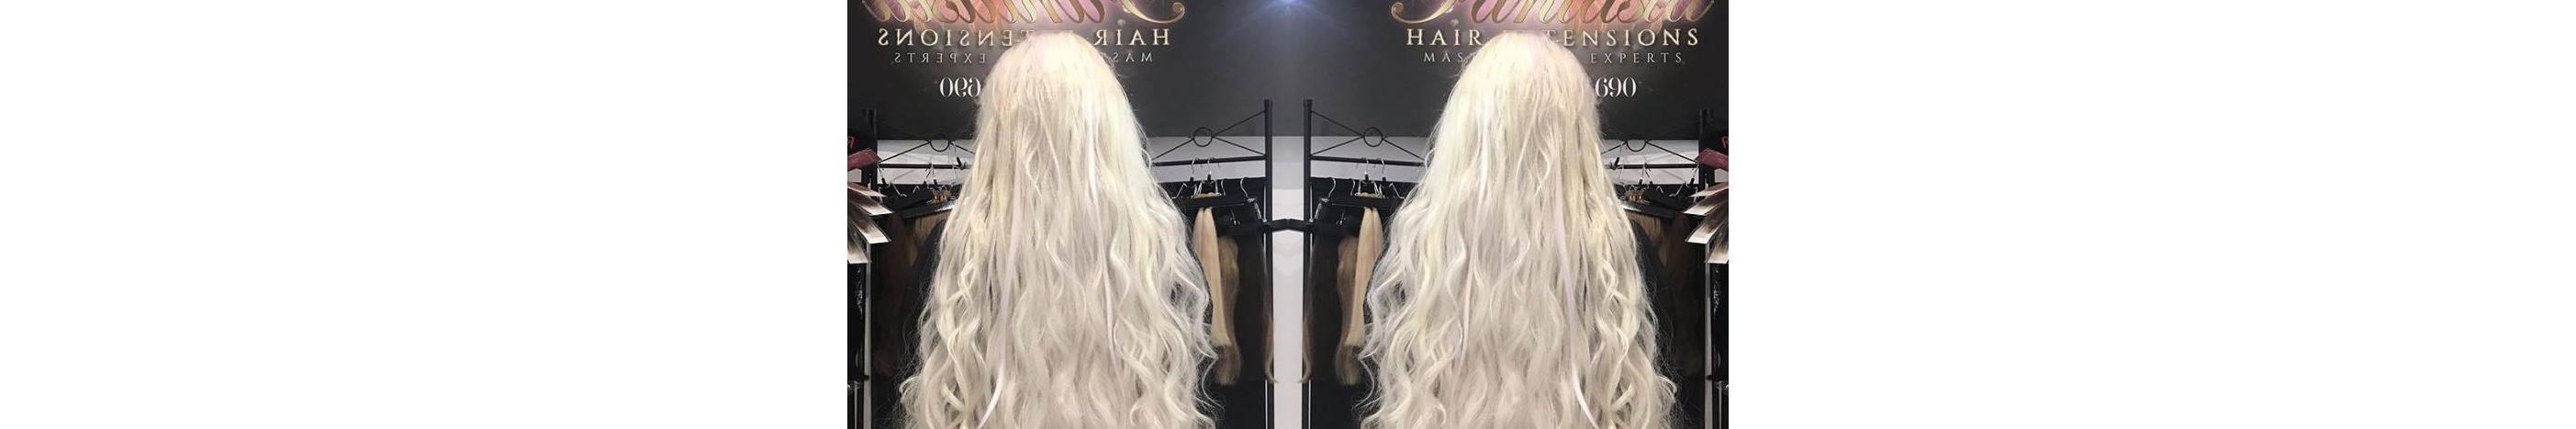 Fantasia Hair Extensions